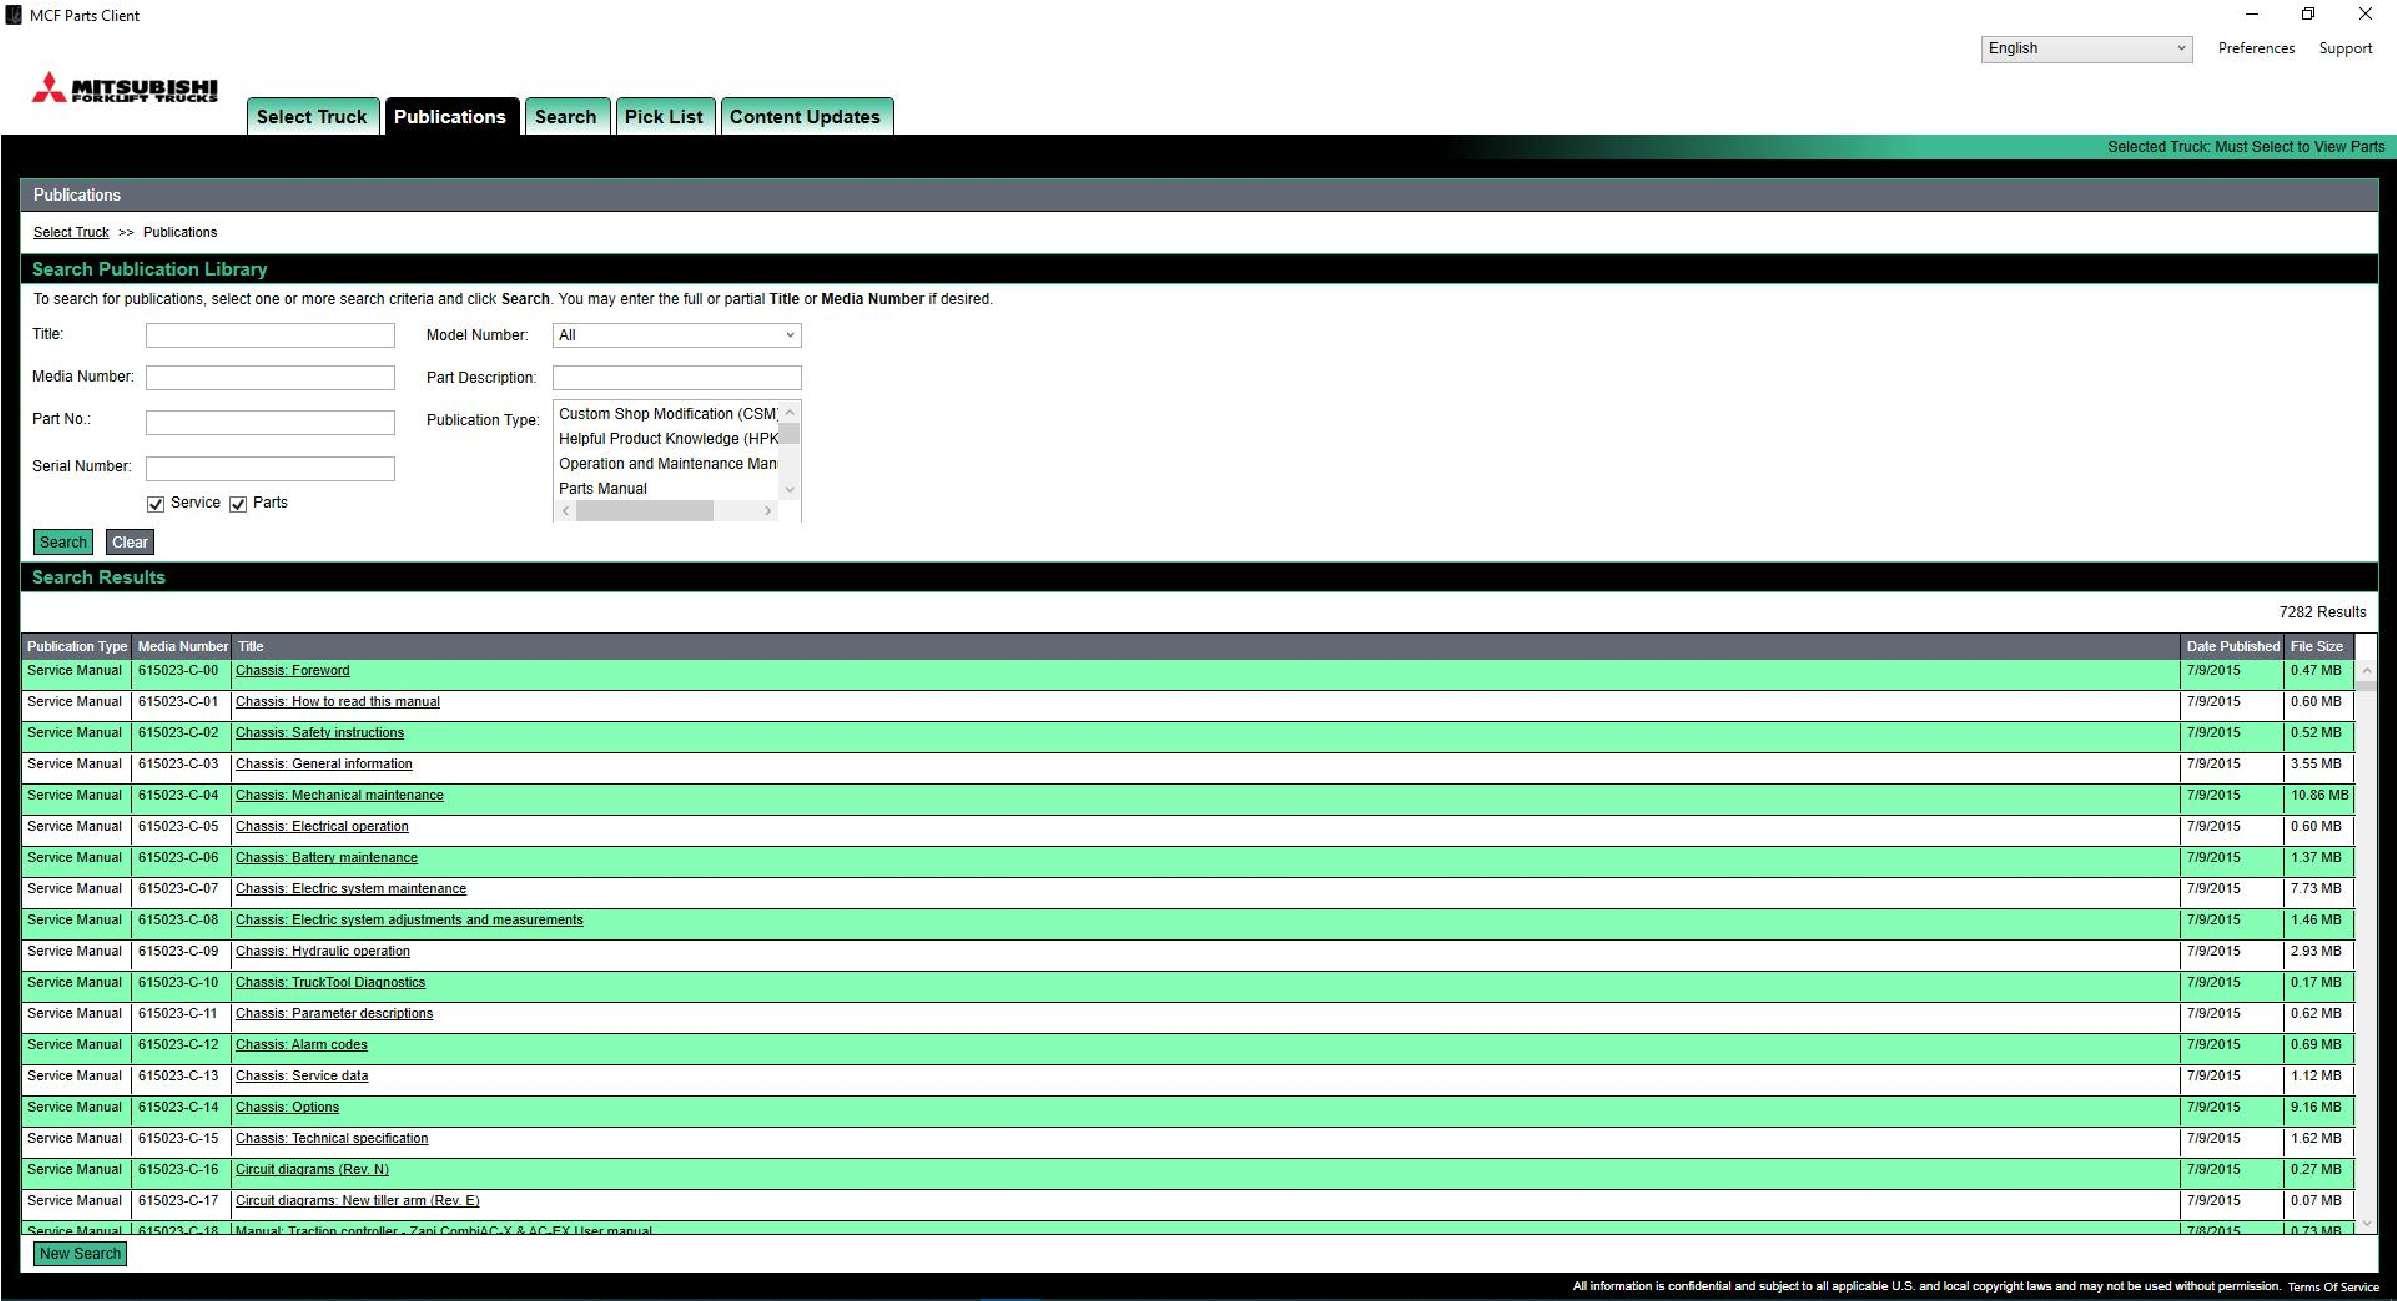 Mitsubishi Forklift Trucks MCFA 2020 Spare Parts Catalogue + Service Manuals SS-01